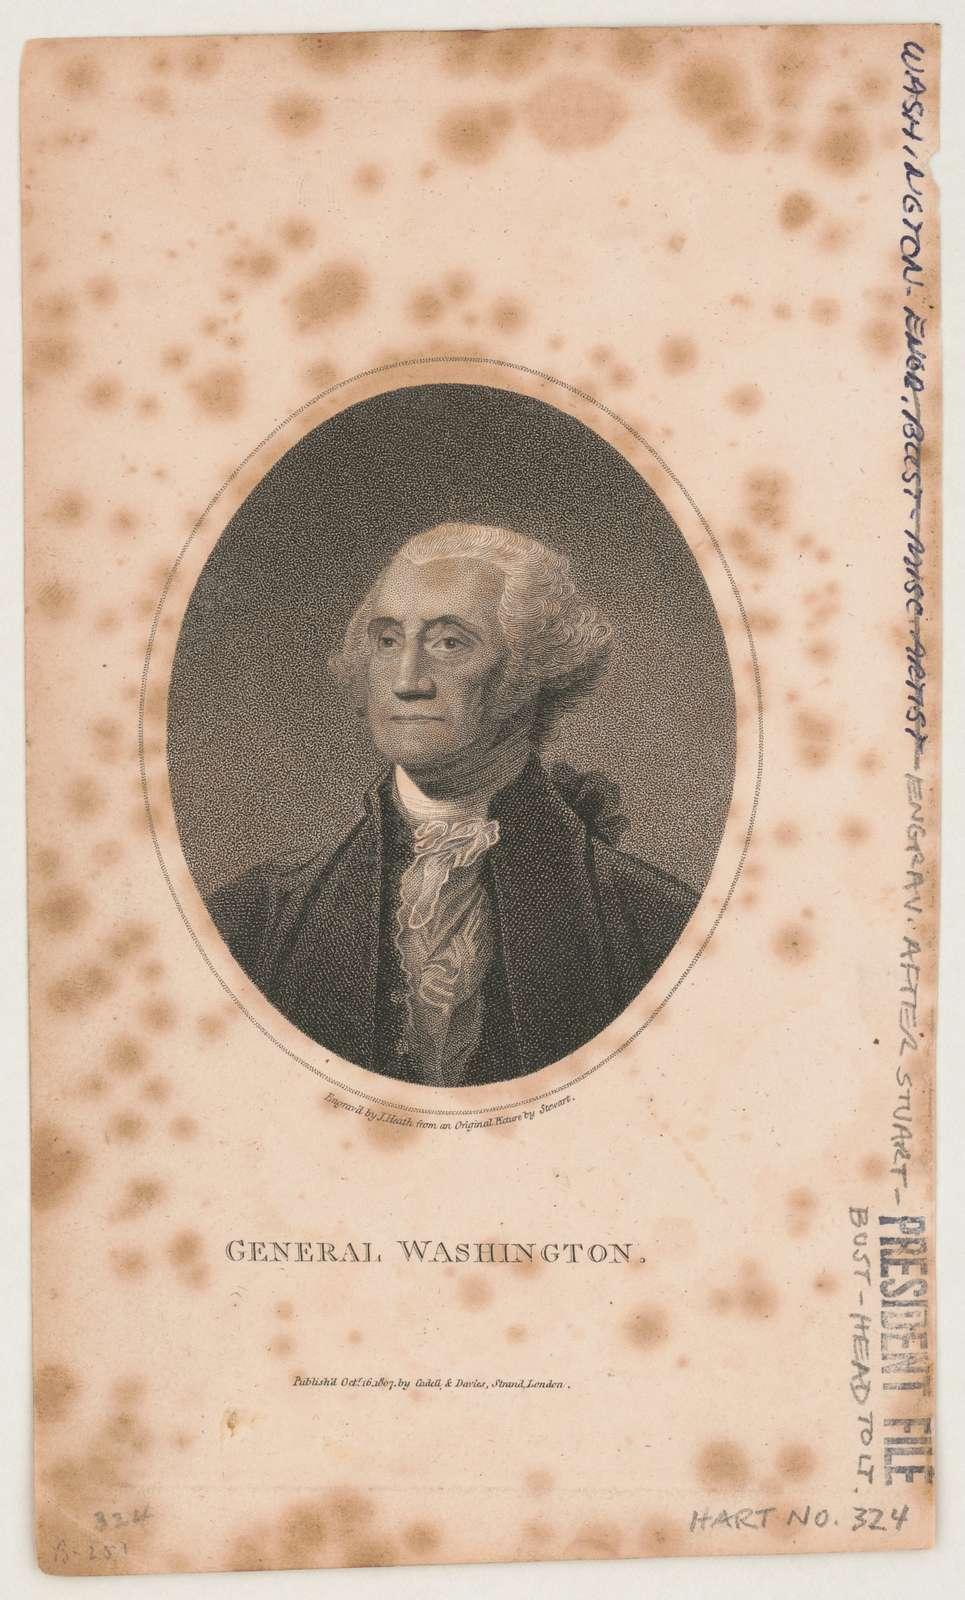 General Washington engrav'd by J. Heath from an original picture by Stewart